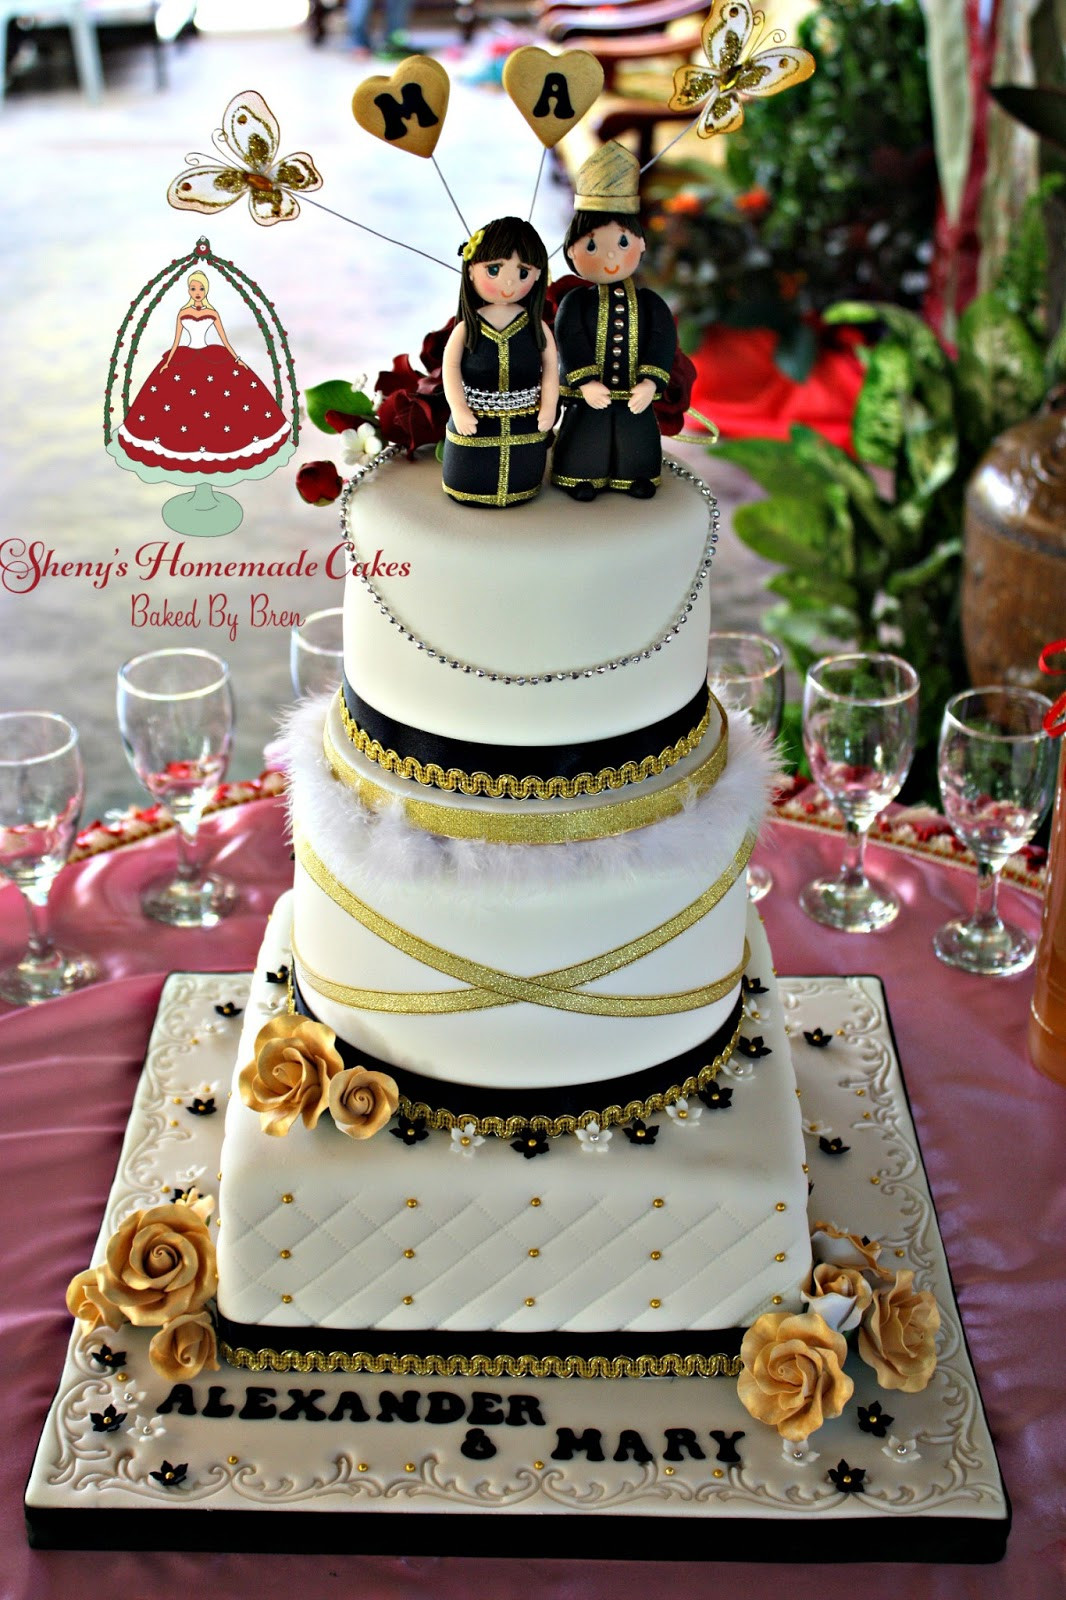 Wedding Cakes Theme  Sheny s Homemade Treats Traditional Kadazan Theme Wedding